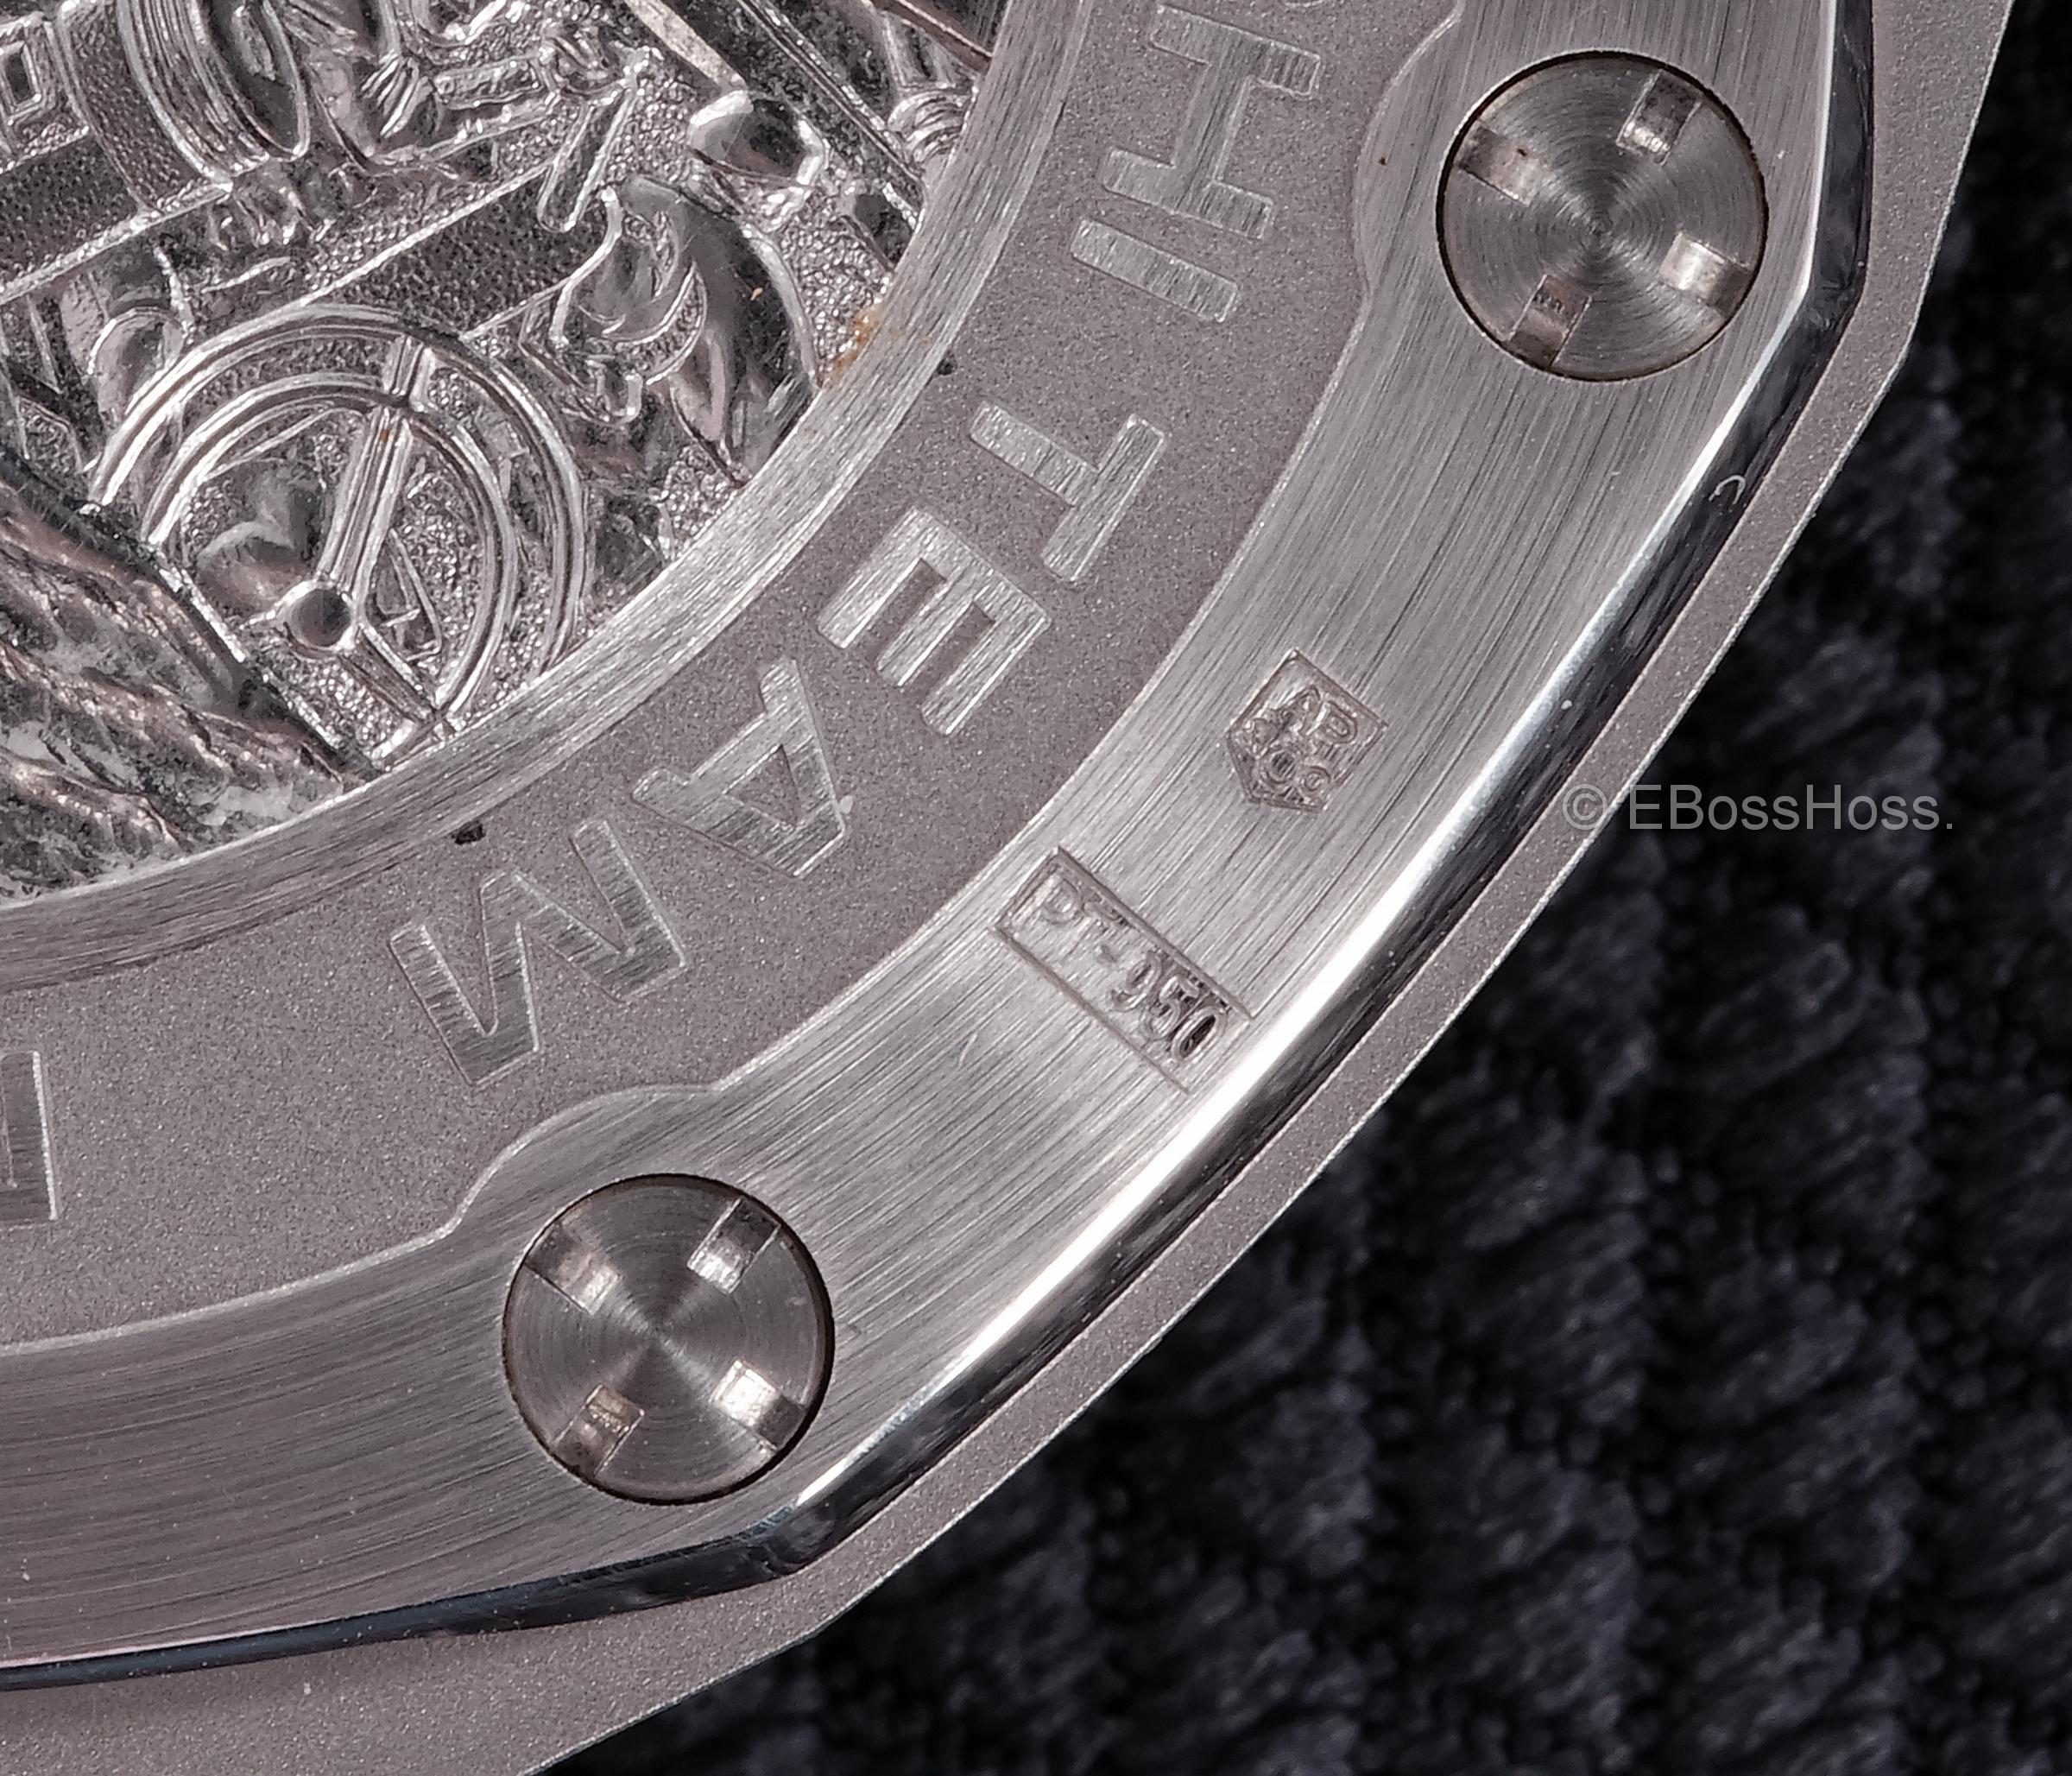 Audemars Piguet (AP) ROO Alinghi Team Chronograph (Platinum) - 26062PT.OO.A002CA.01